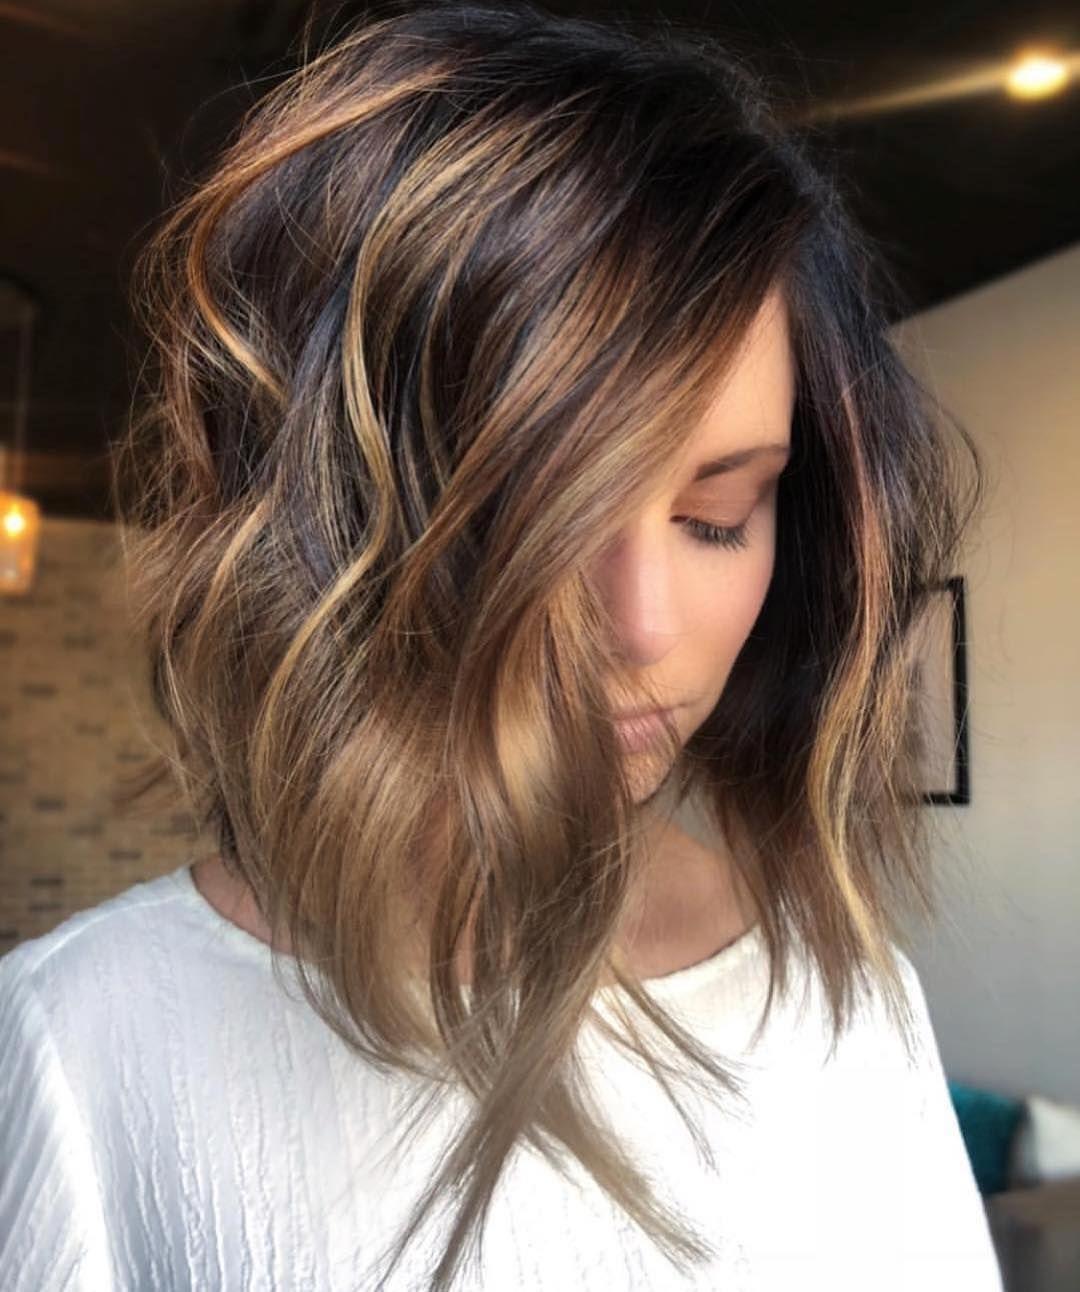 Stylish Ombre Balayage Hairstyles For Shoulder Length Hair 2019 Medium Haircut Hair Styles Hair Lengths Medium Hair Styles